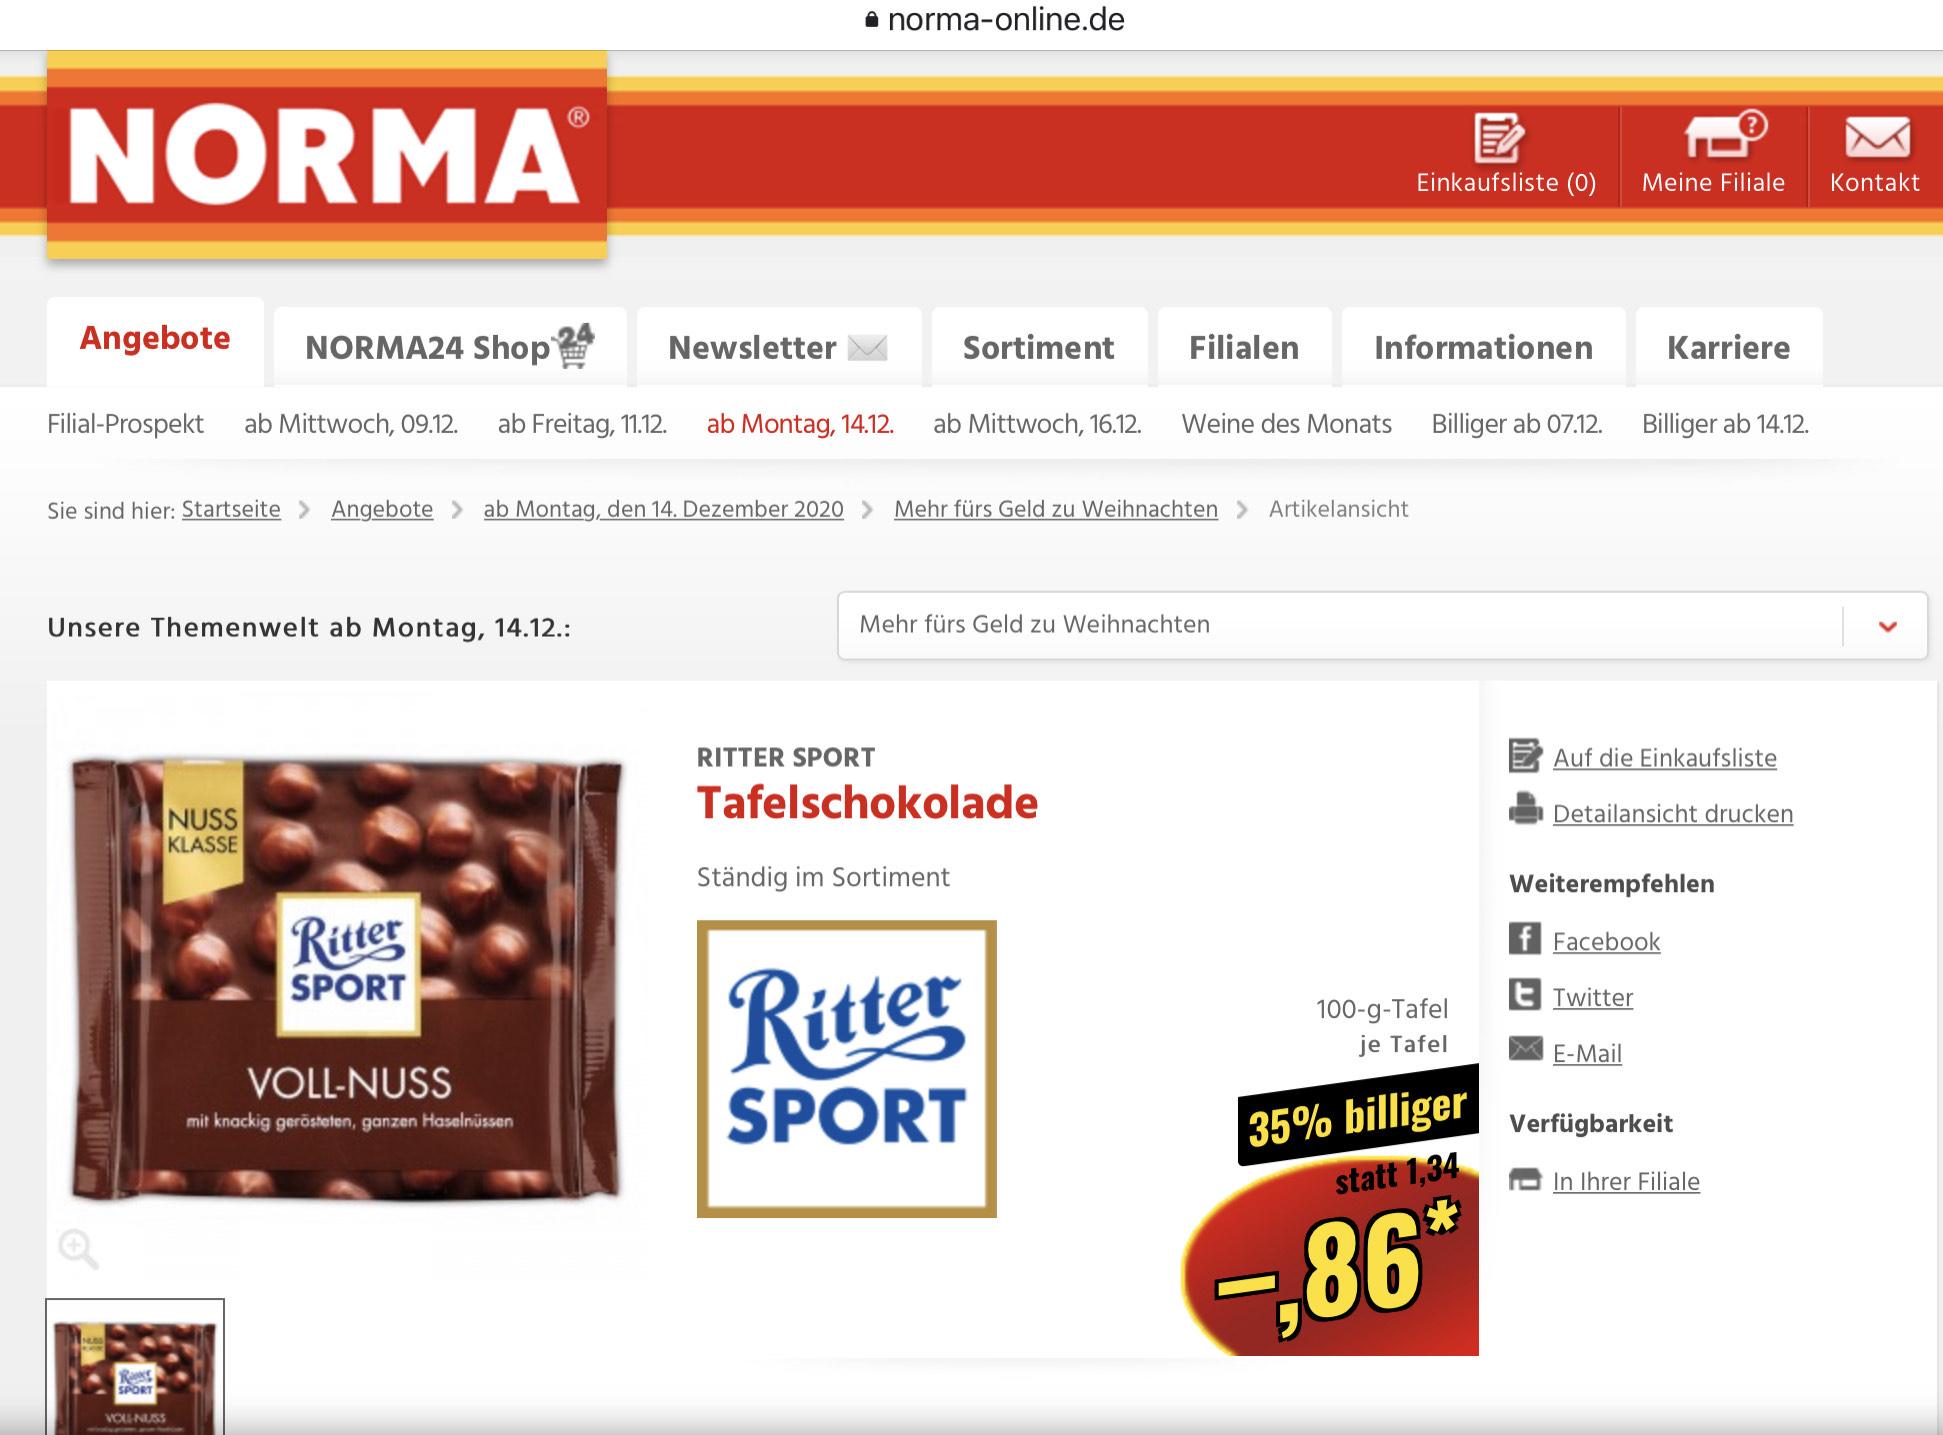 Ritter Sport Nussklasse NORMA 0,86€ ab Montag 14.12.